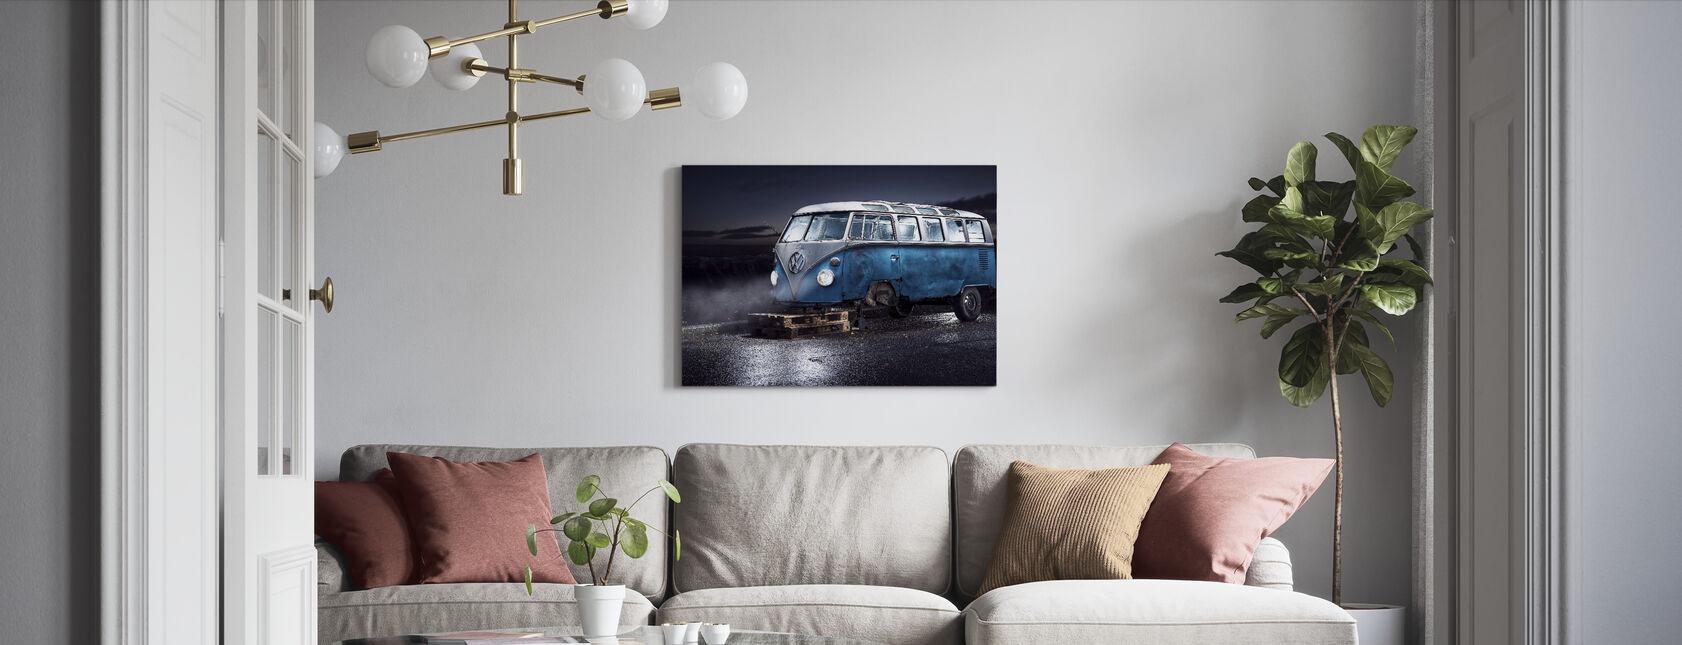 VW minibuss - Lerretsbilde - Stue